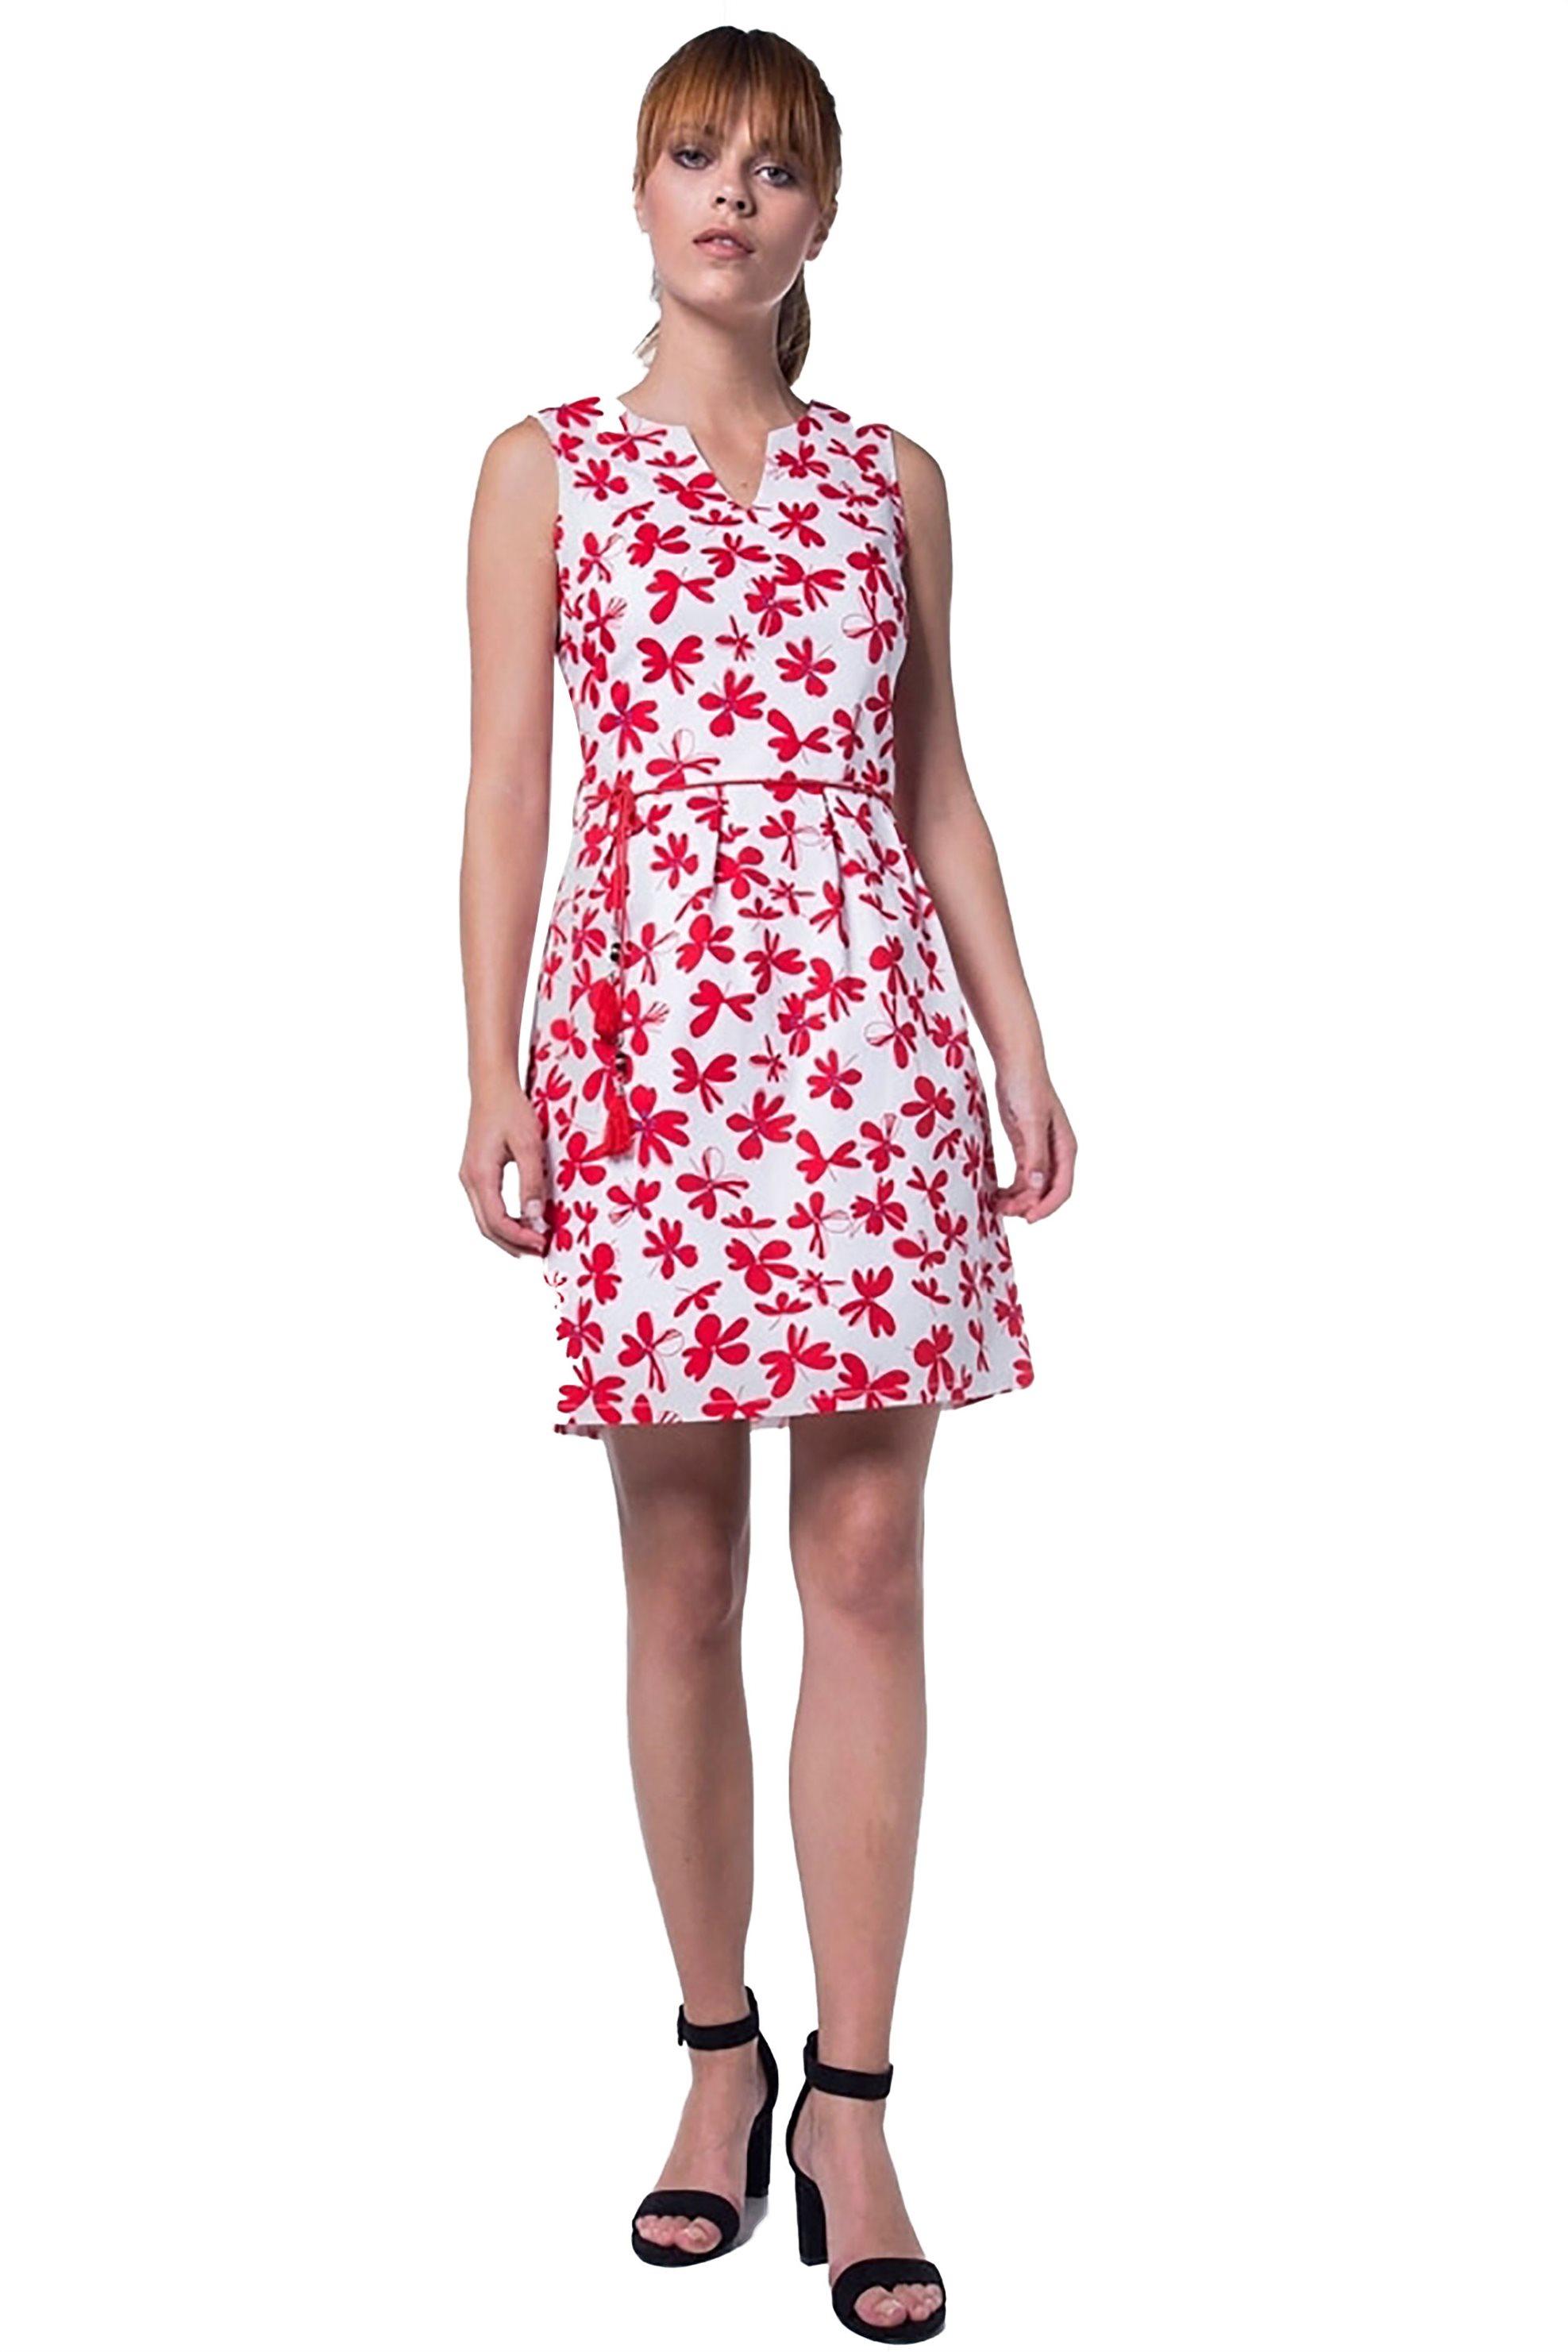 e3c4161f3ef4 Γυναικεία   Ρούχα   Φορέματα   Καθημερινά   KATRUS all day φορεμα ...